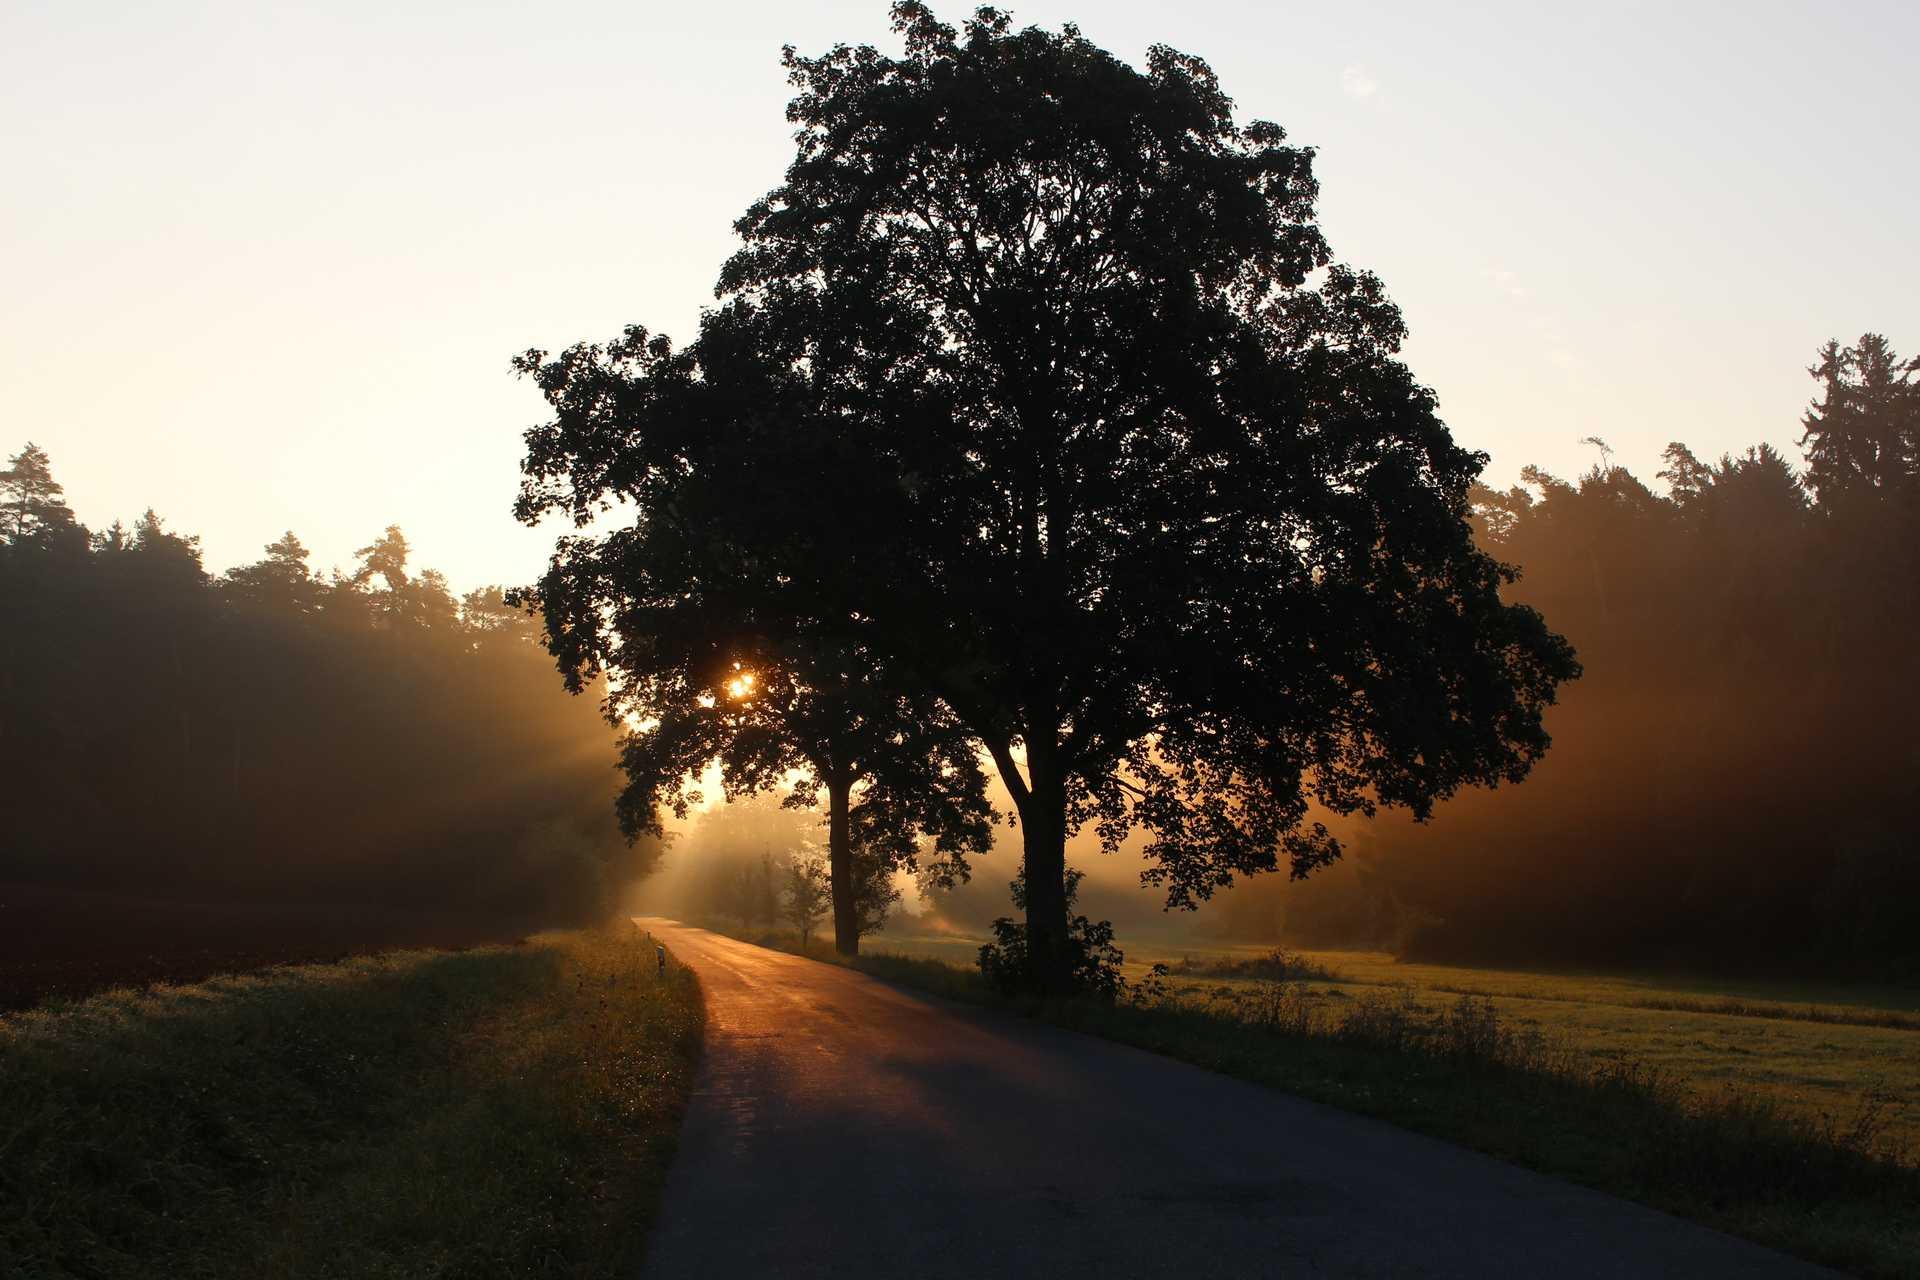 Rural Bavarian countryside sunset